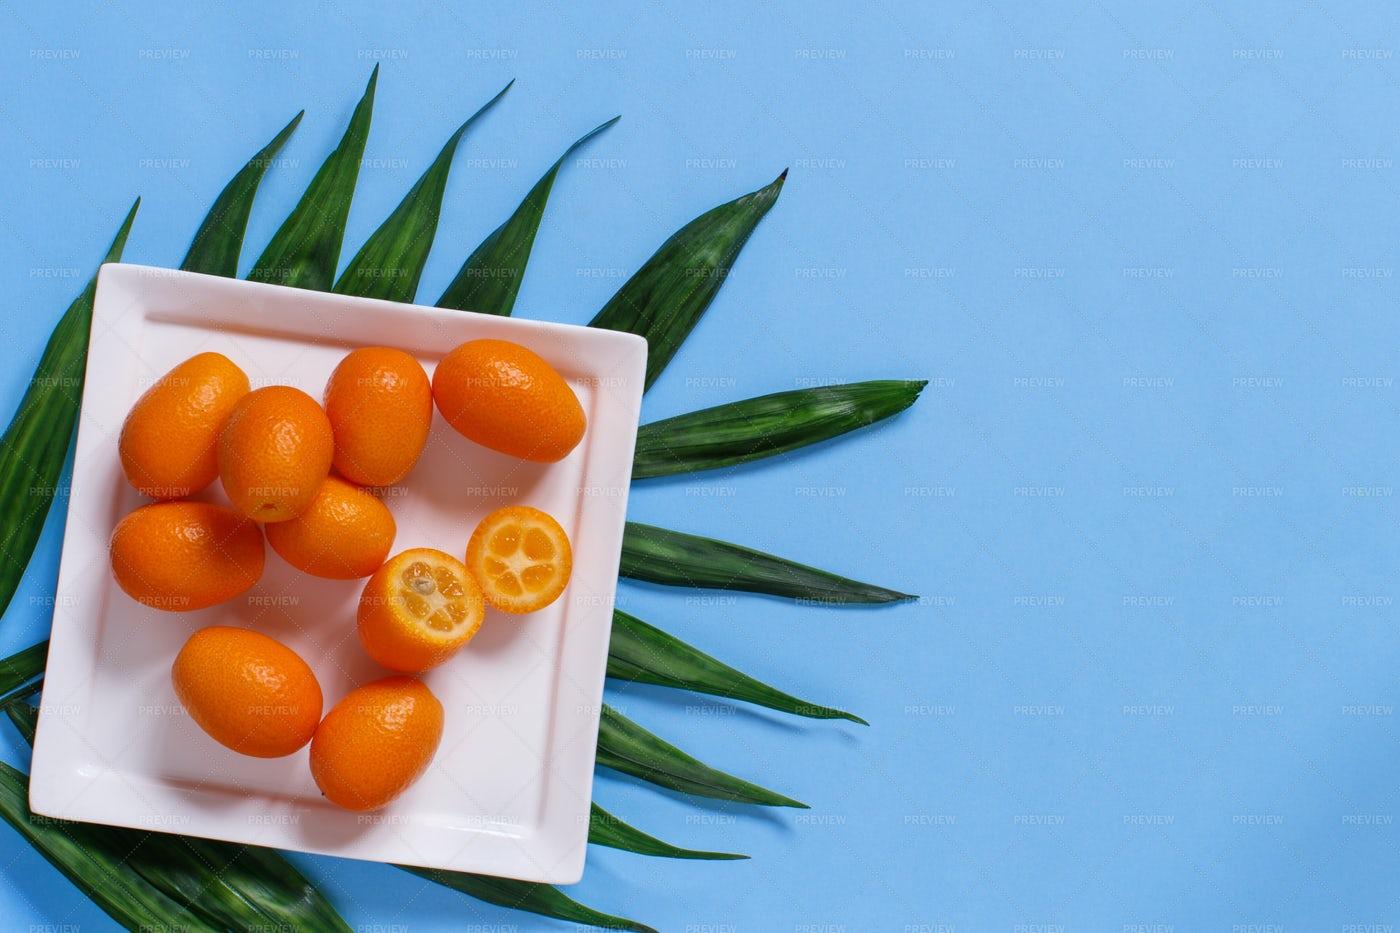 Kumquat Fruits On Blue: Stock Photos